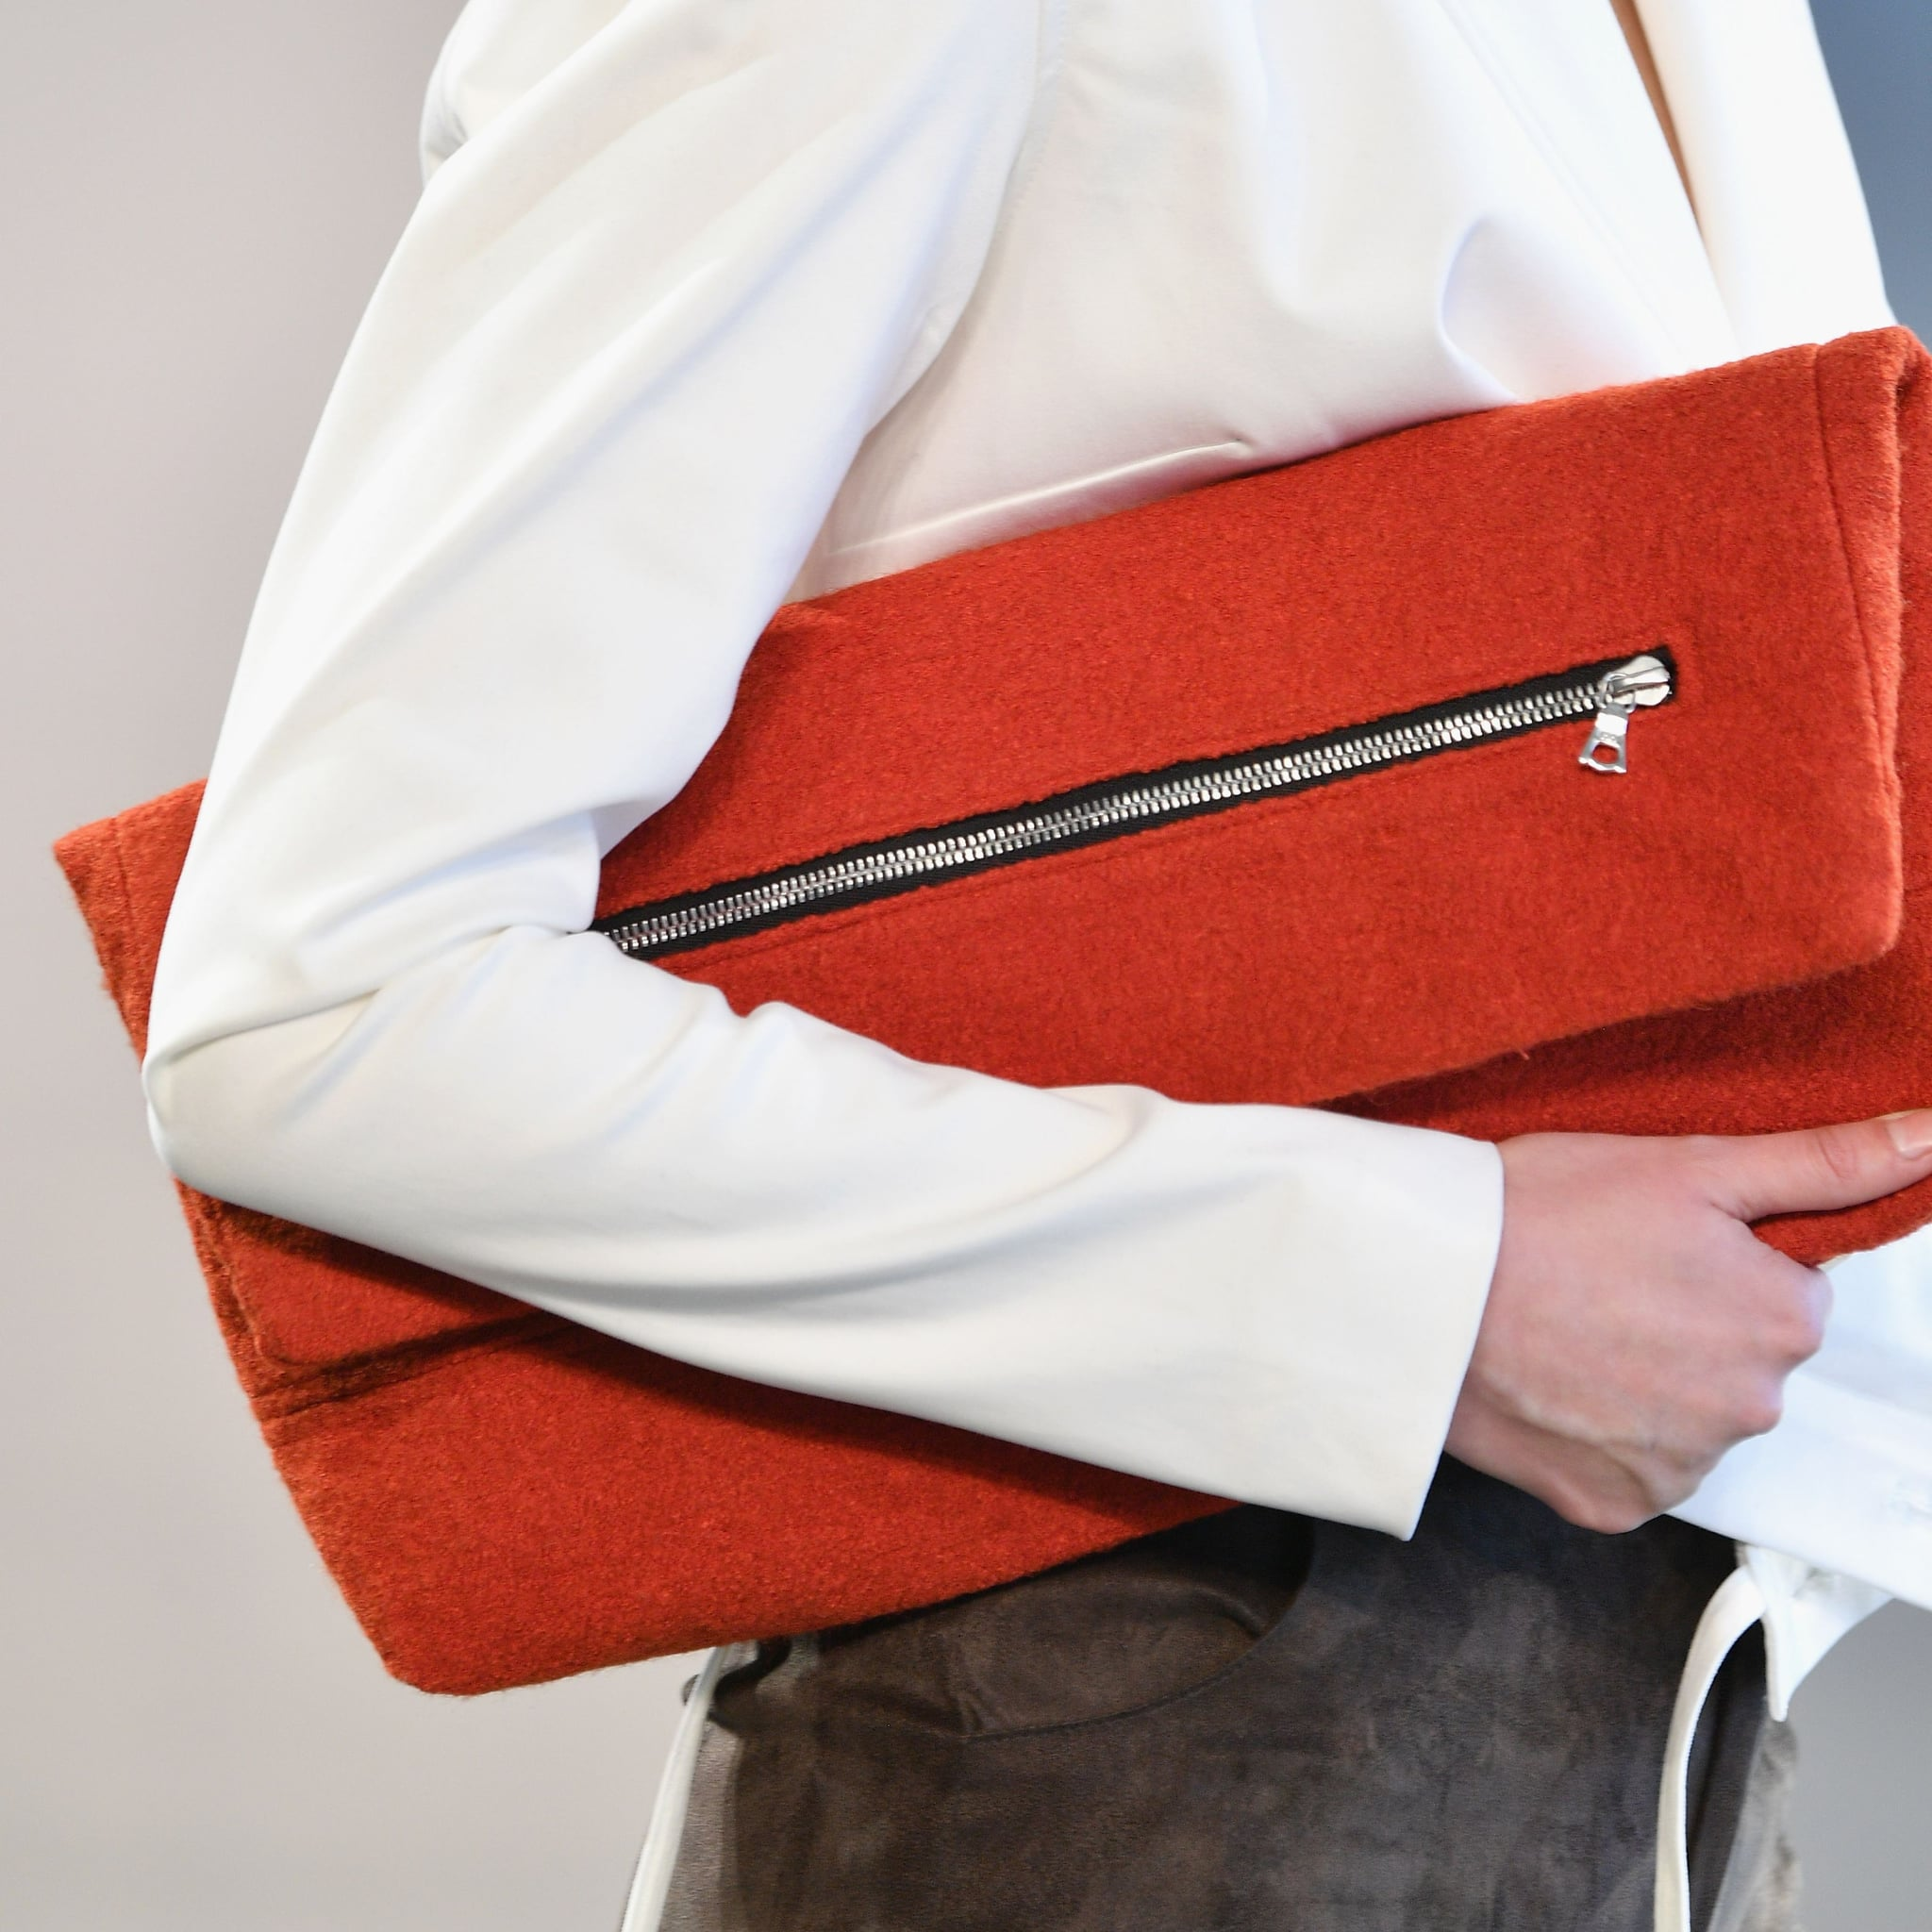 c41491a83bb9 Bag Trends Fall 2019 | POPSUGAR Fashion Middle East